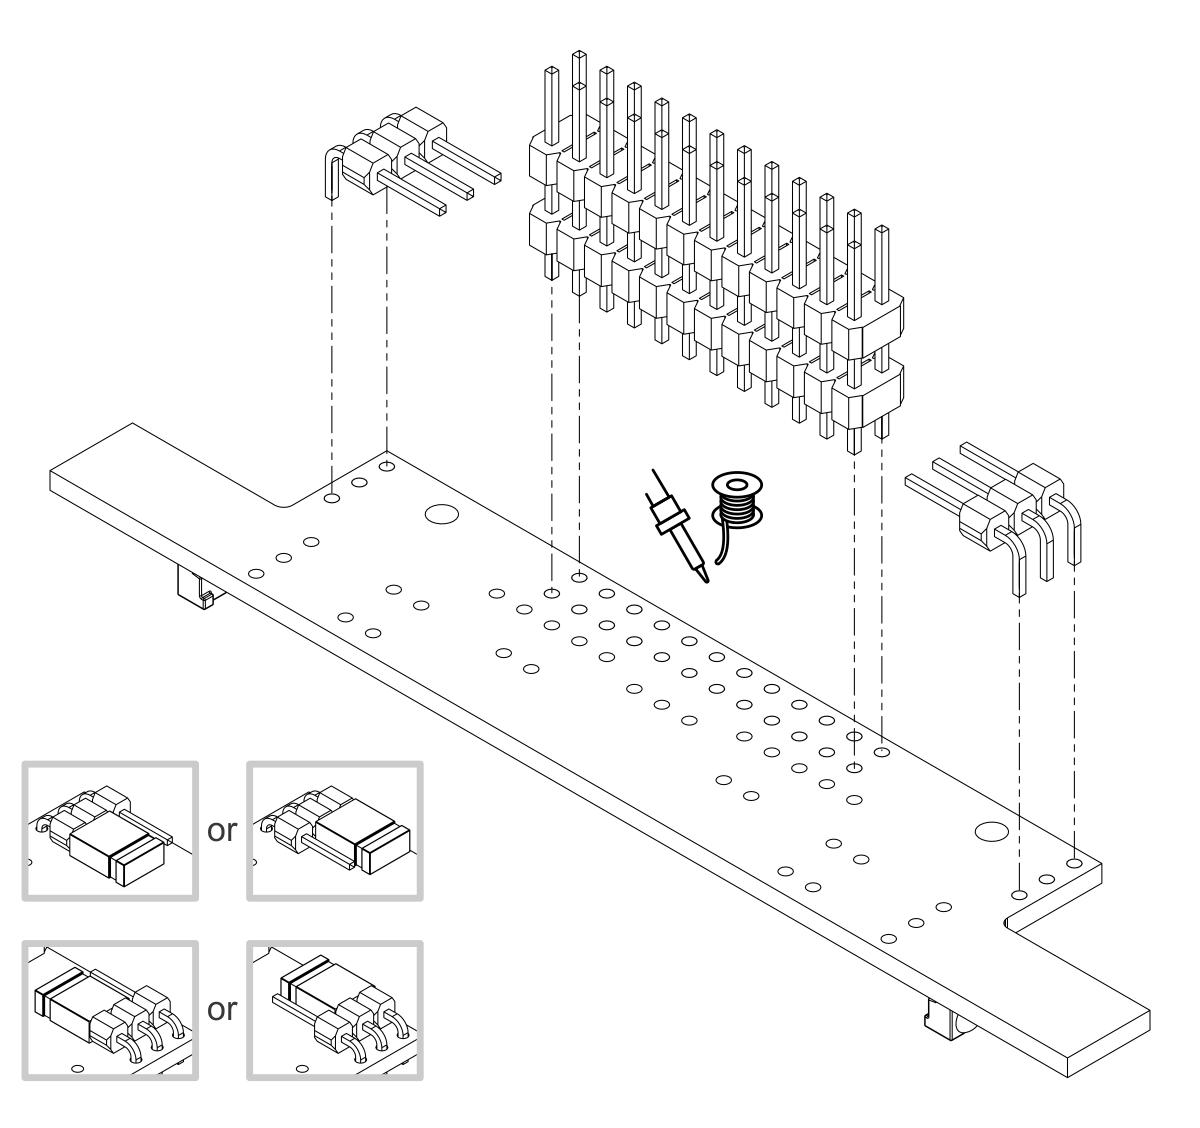 pololu zumo 32u4 robot user u2019s guide